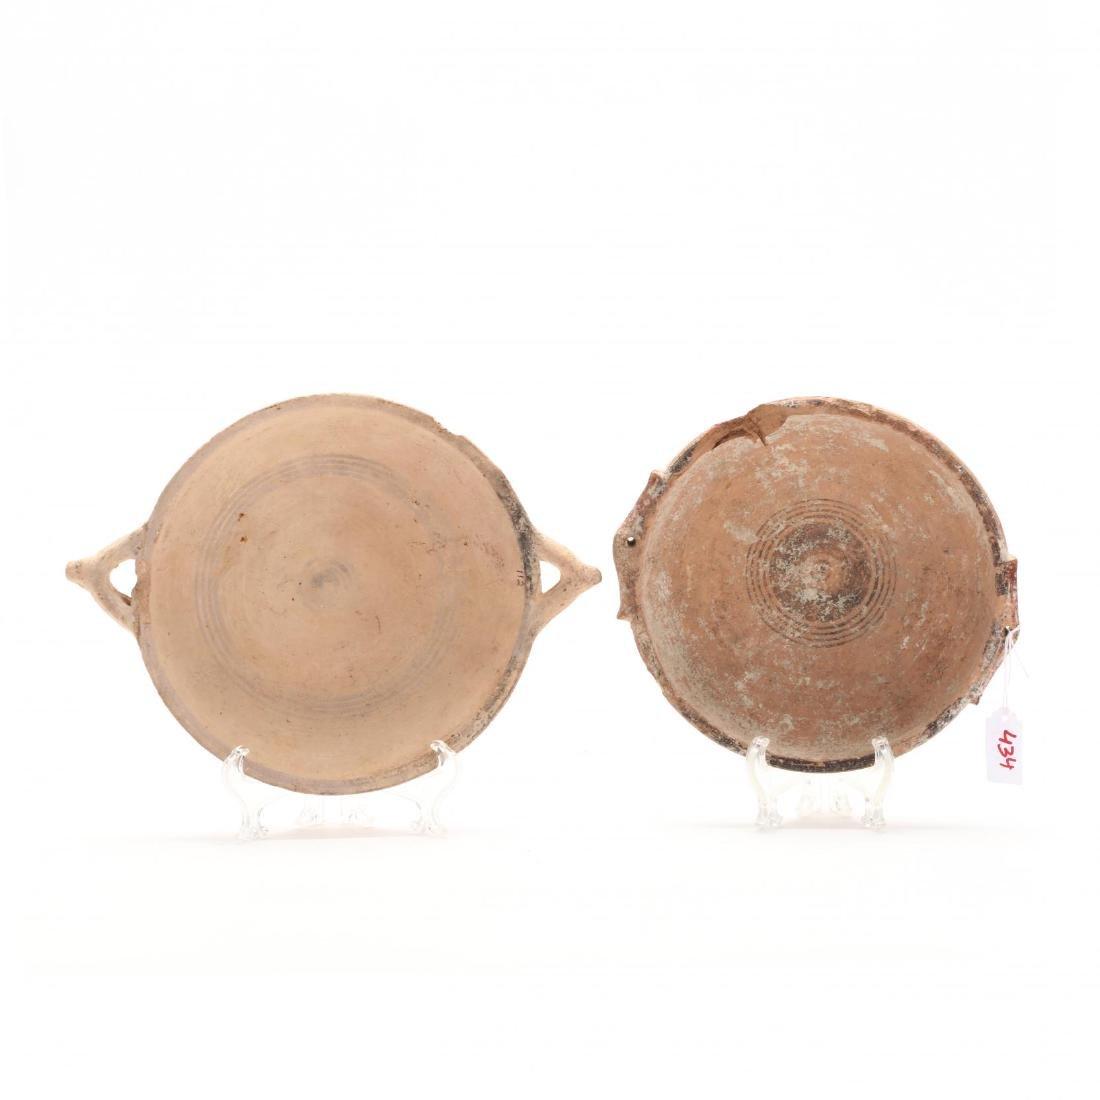 Two Cypro-Geometric Bichrome Dishes